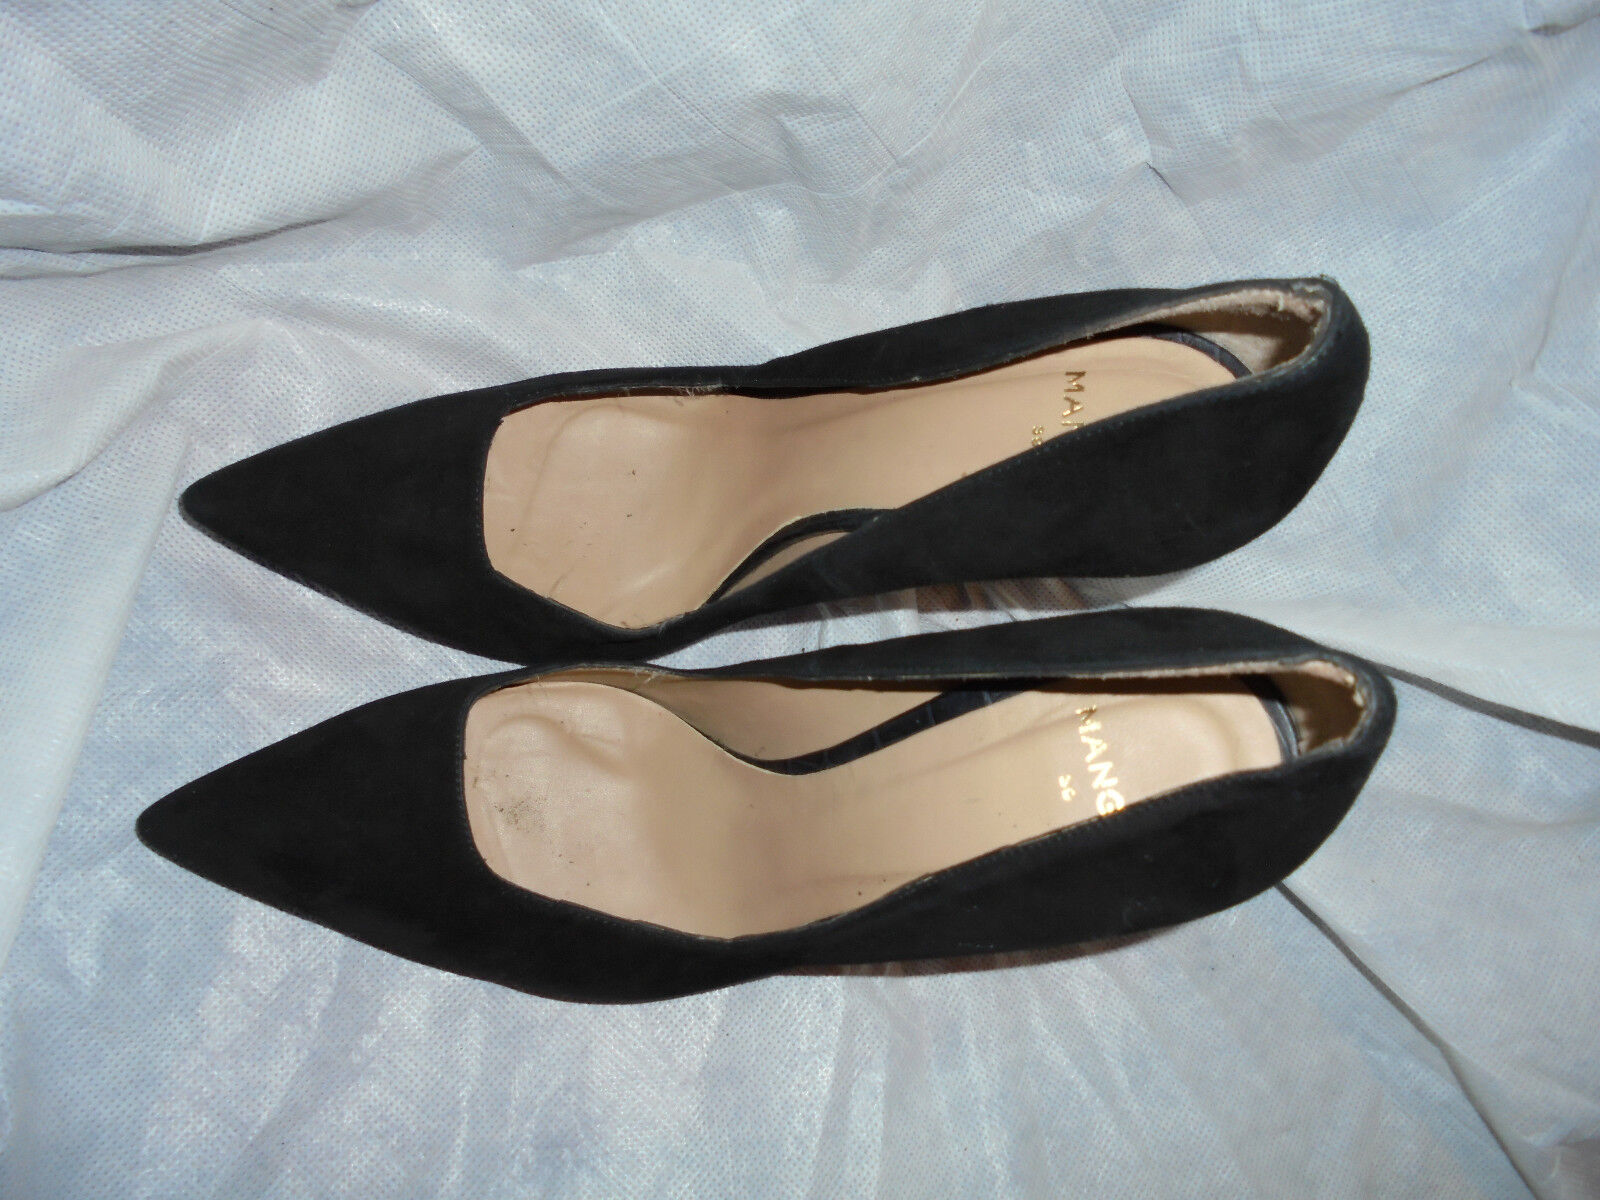 MANGO WOMEN'S BLACK SUEDE Schuhe LEATHER SLIP ON HEEL Schuhe SUEDE  SIZE UK 6 EU 39 VGC ab83fa